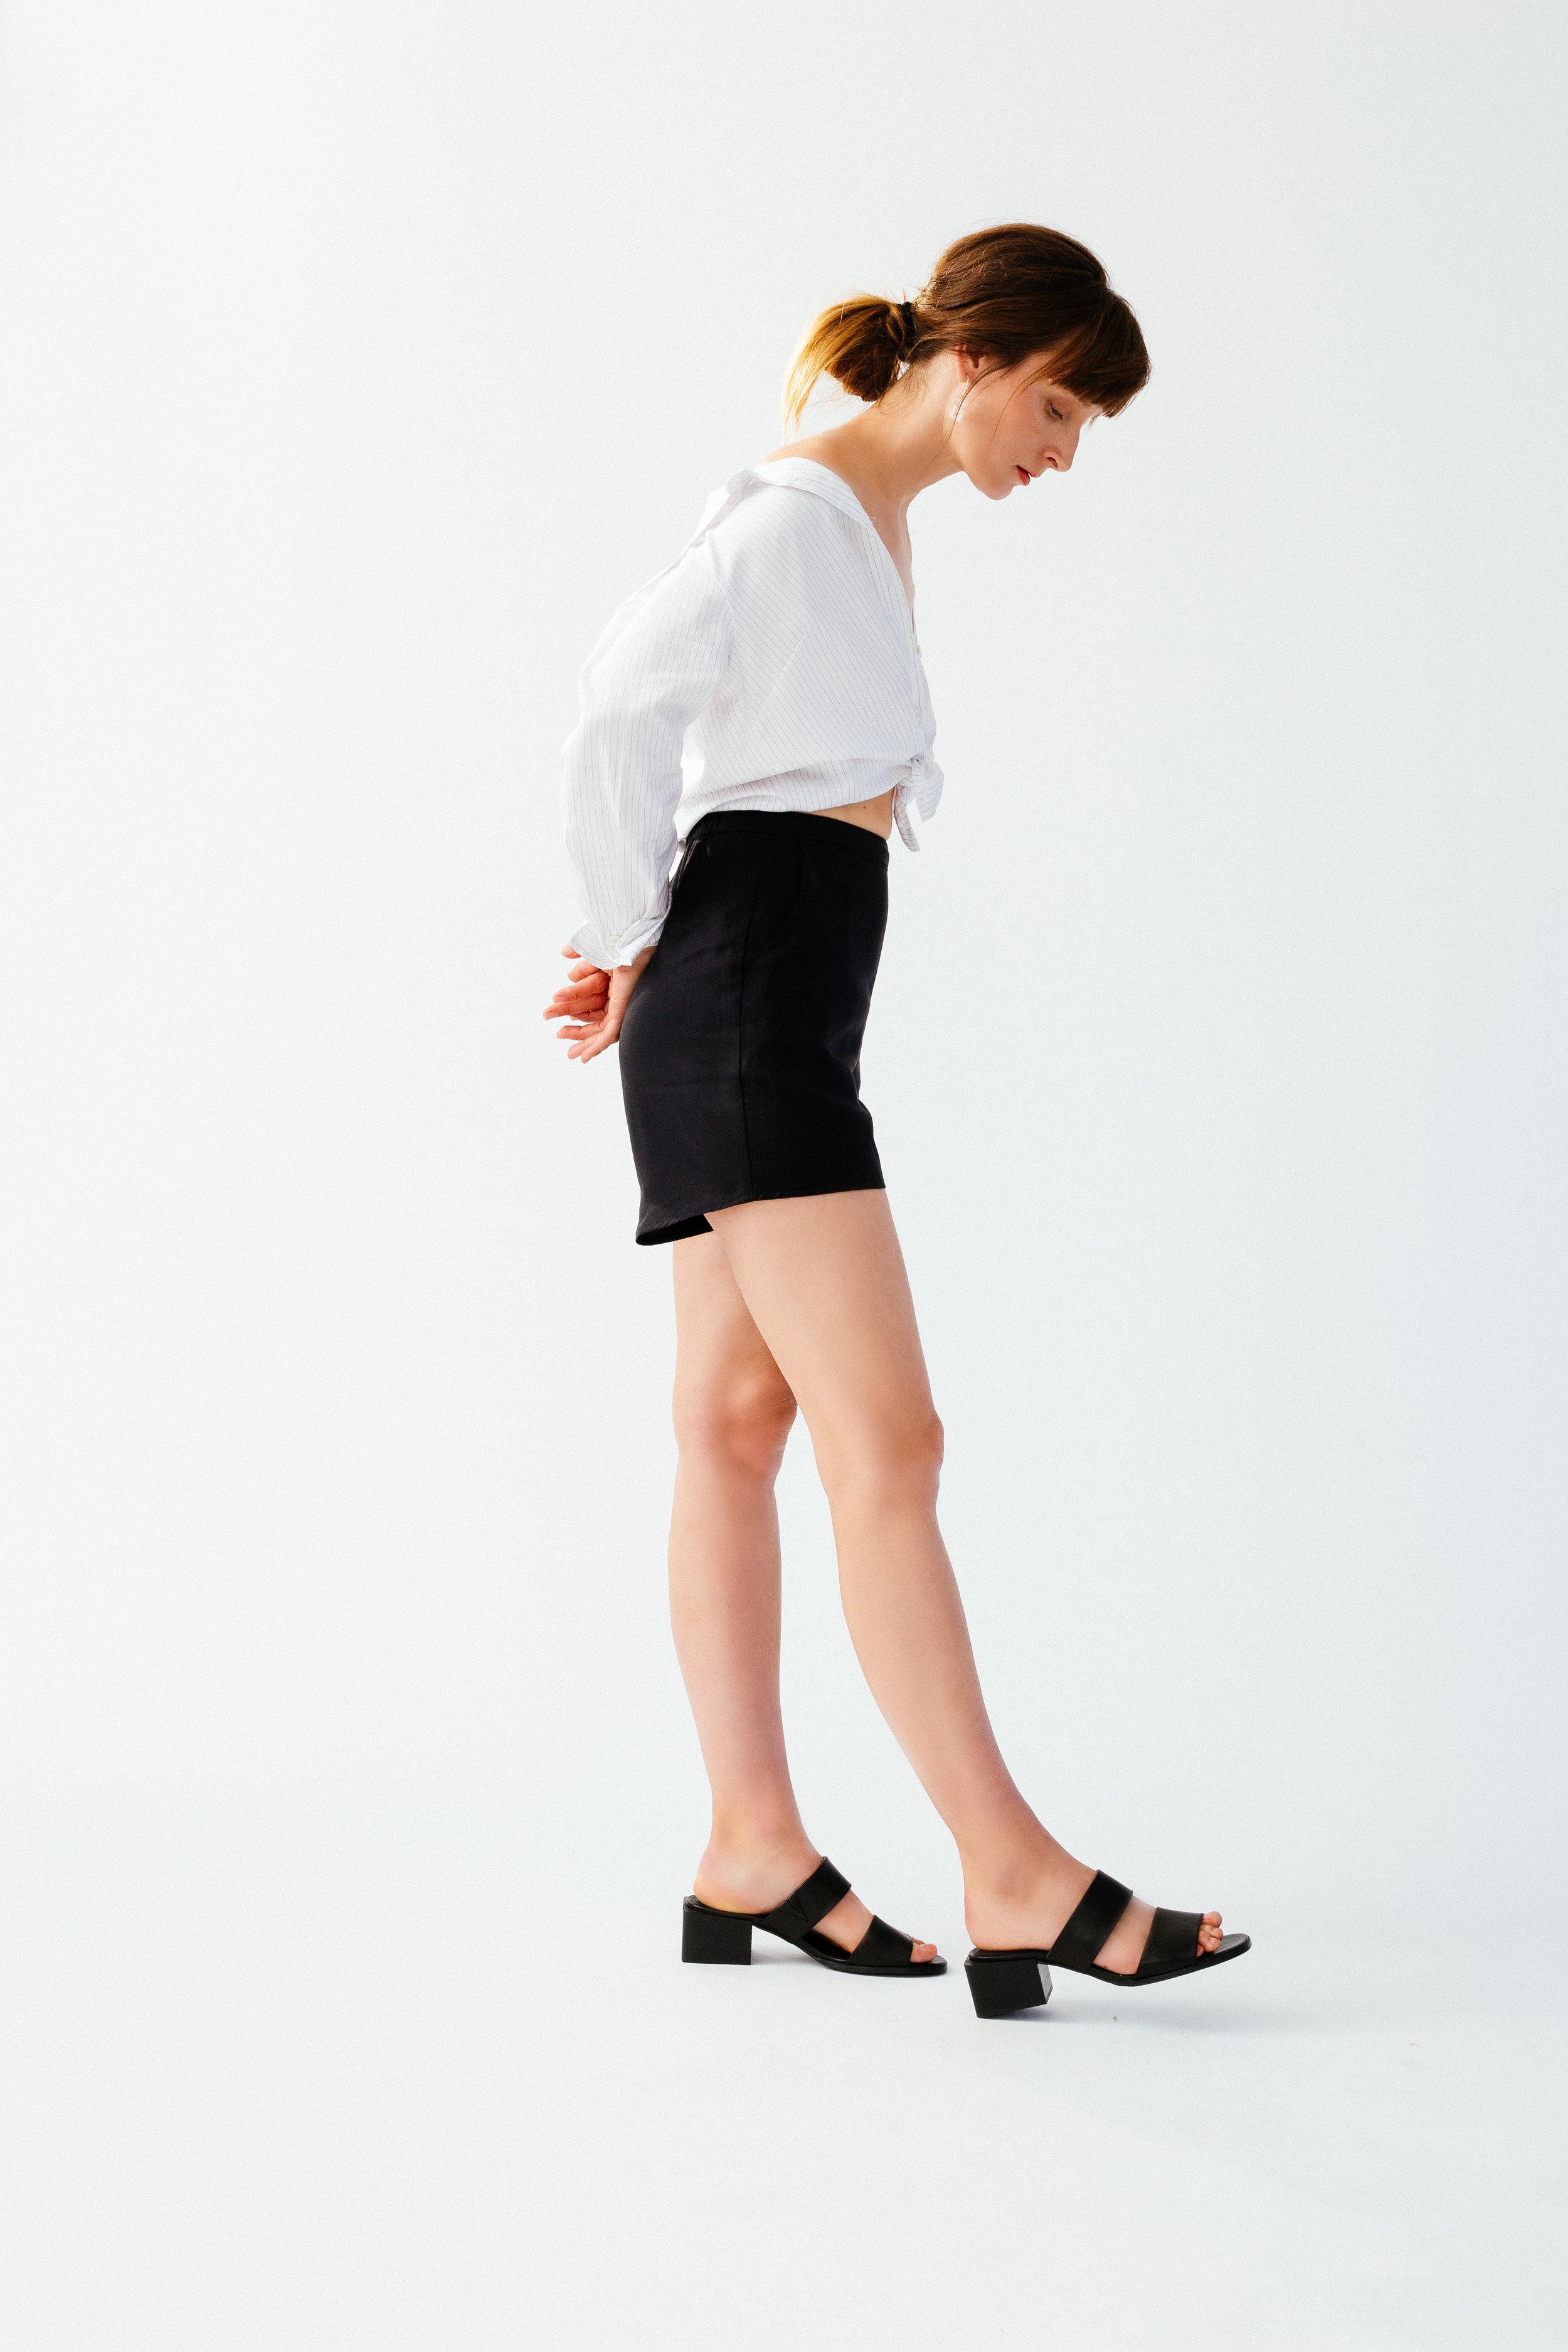 ellice ruiz_sustainable workwear_perfect short.jpg